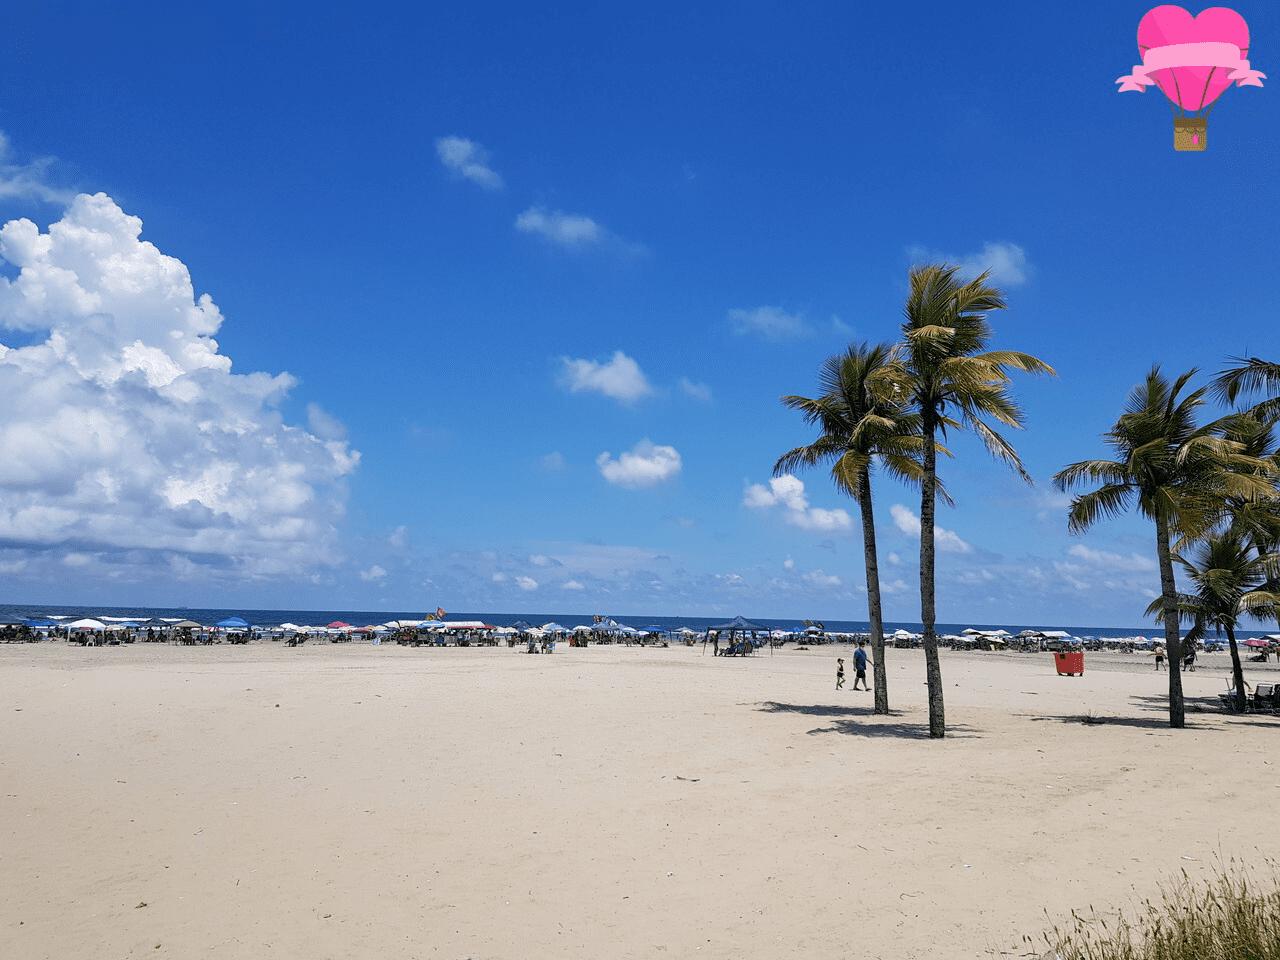 praia-aviacao-praia-grande-sp